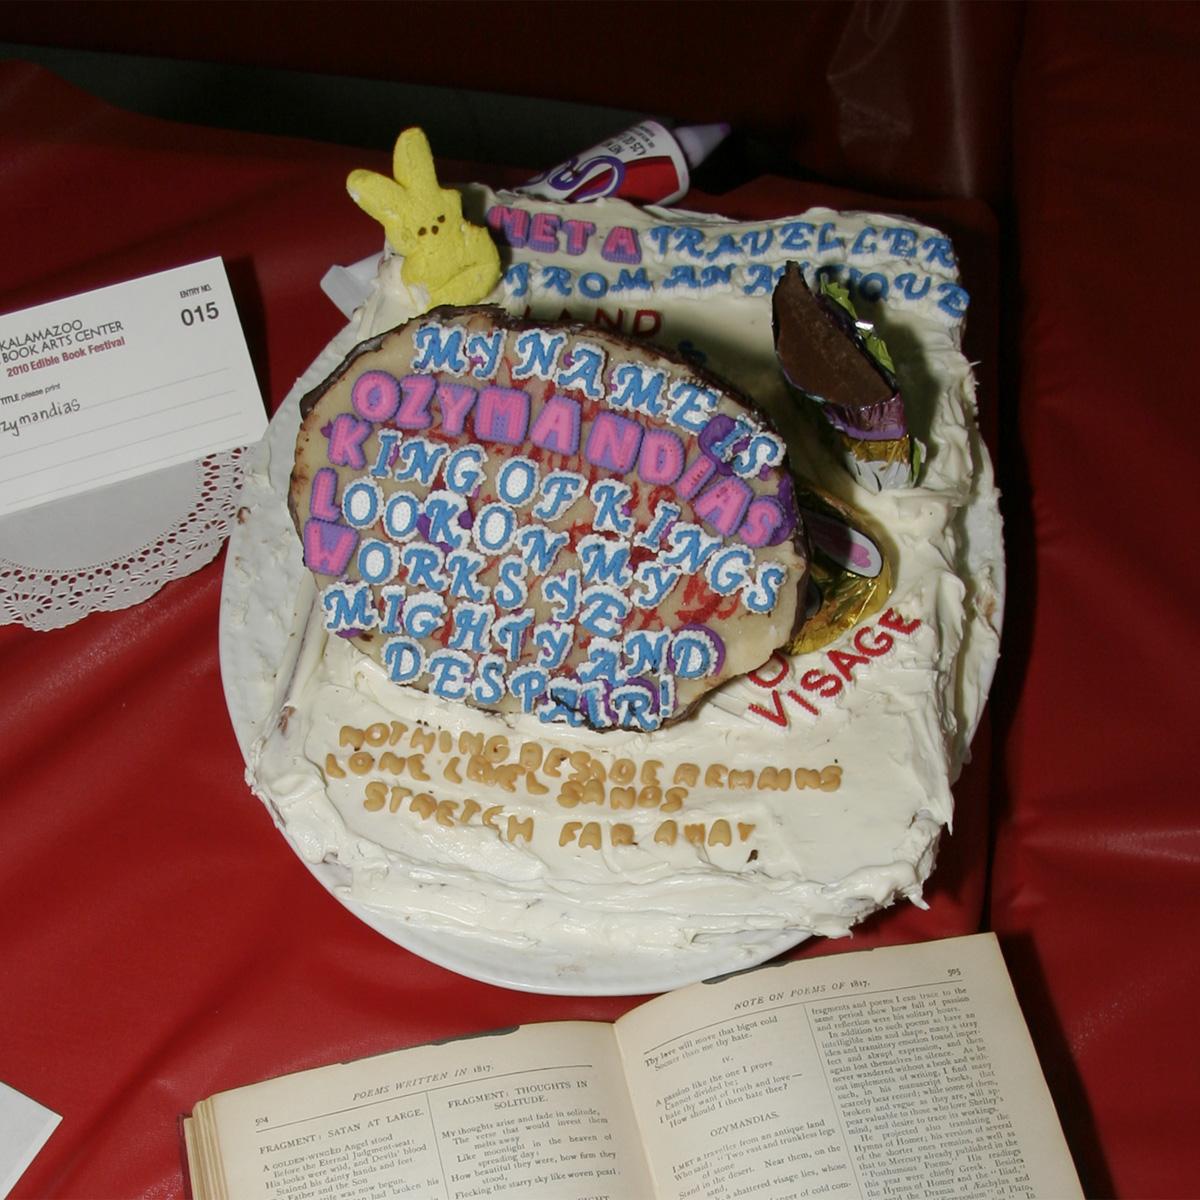 """Ozymandius"" created by Jon Holtzman, 2010 KBAC Edible Book Festival"